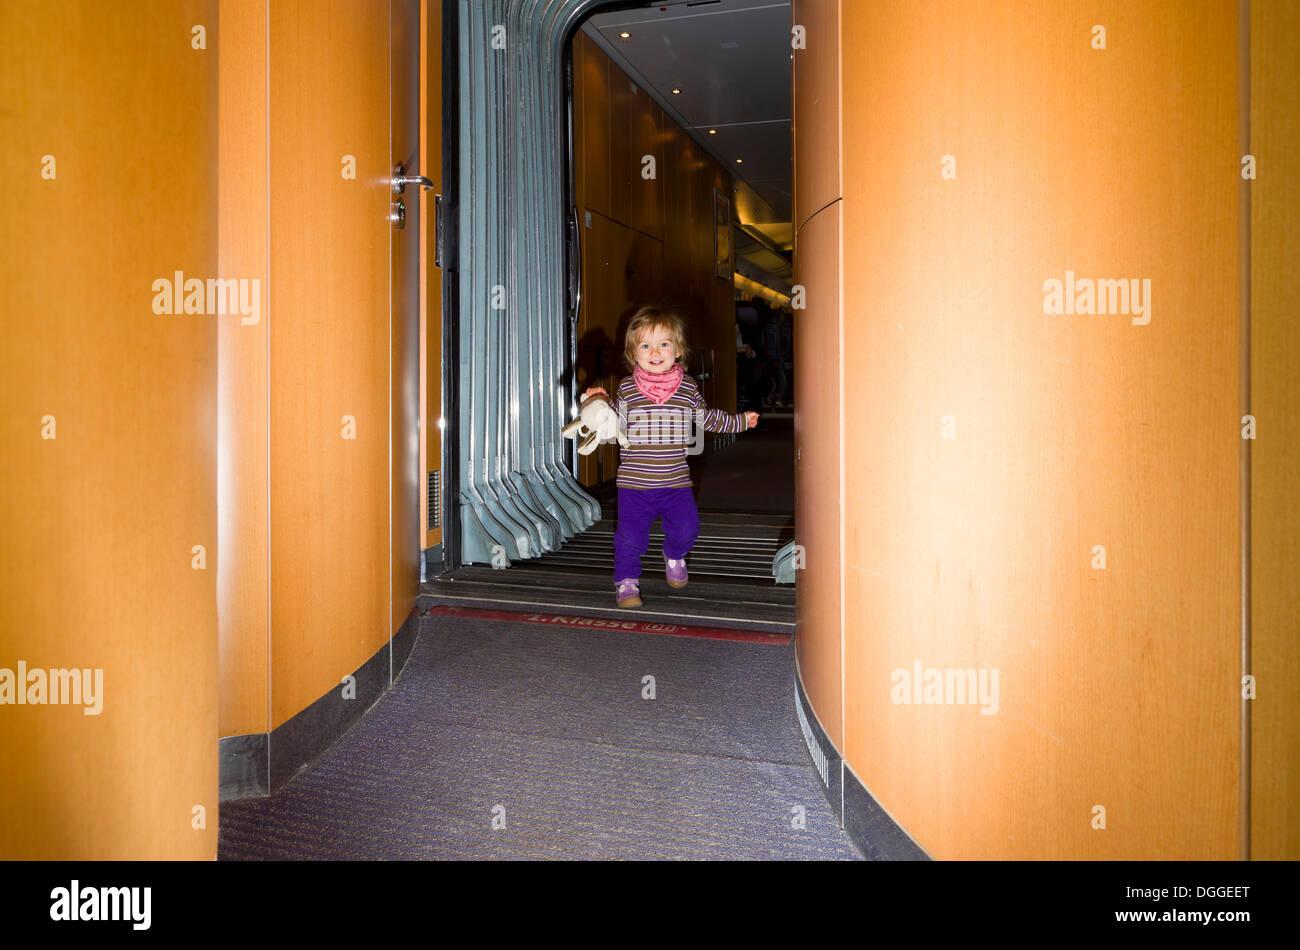 Small child walking inside ICE train, Dresden, Saxony, Germany - Stock Image